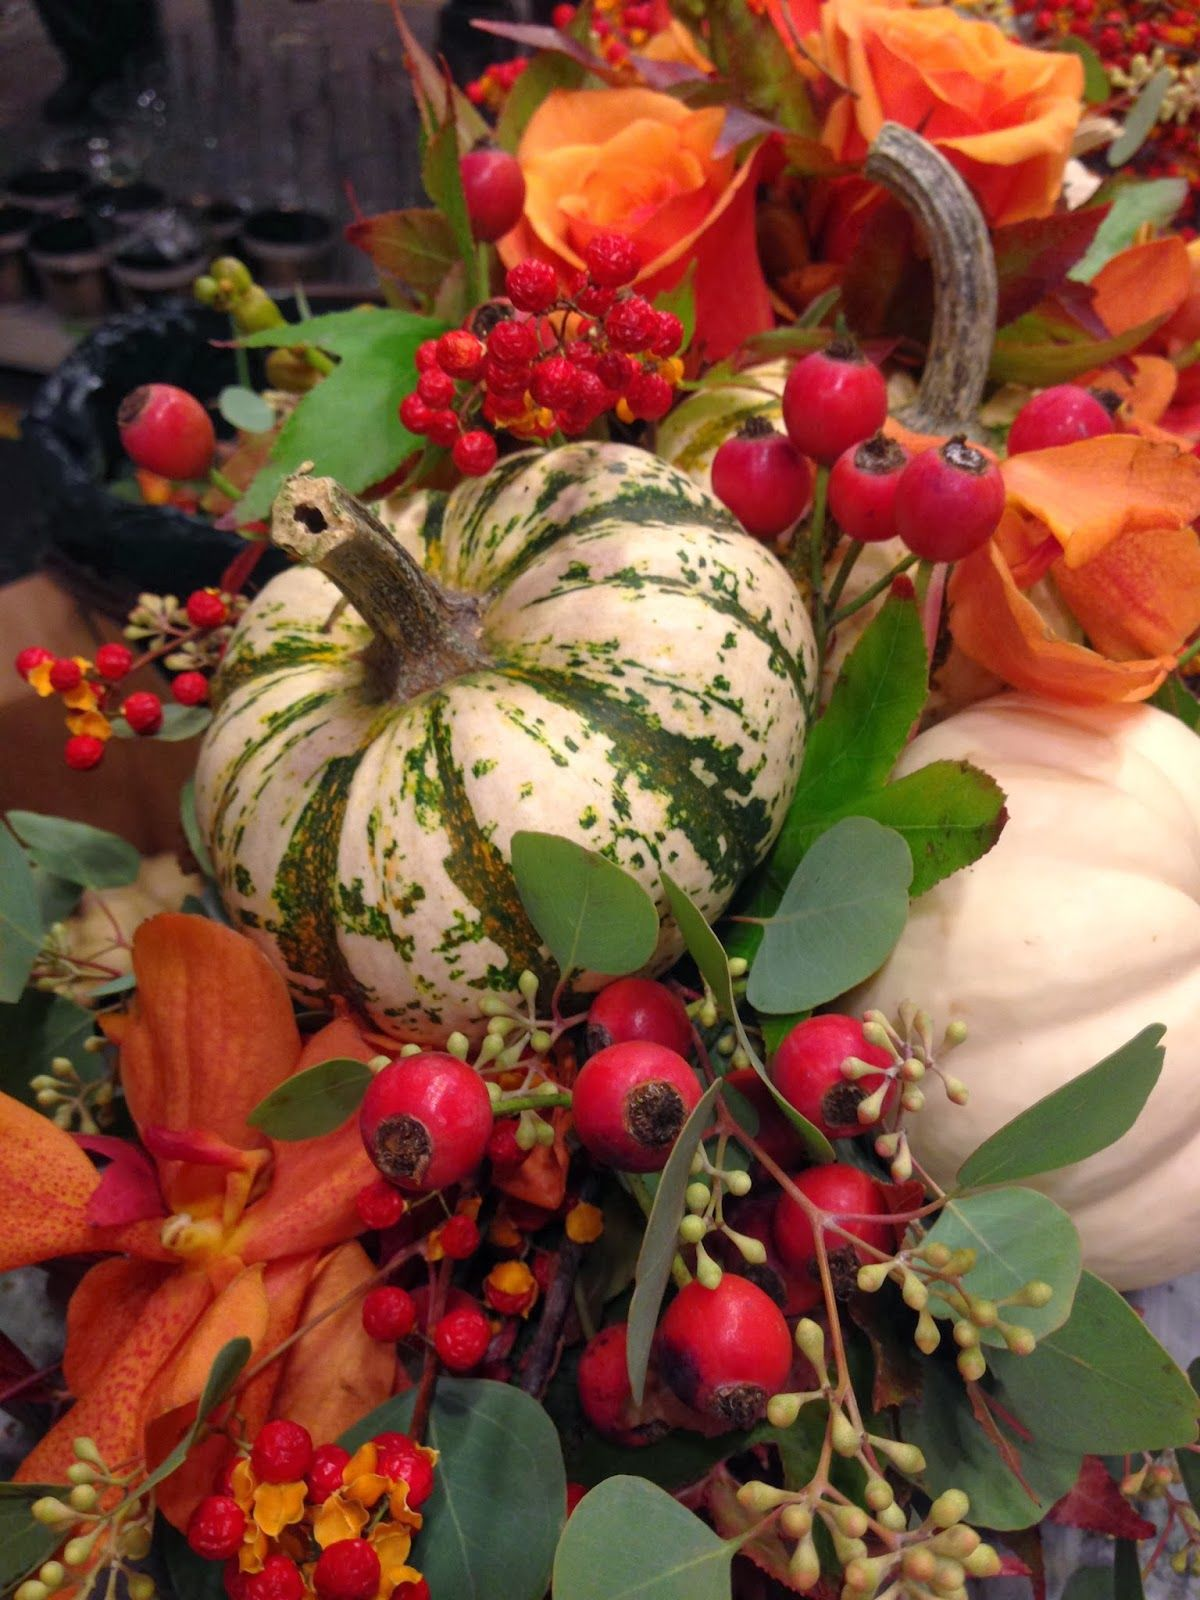 Fall arrangement use of variegated gourds or pumpkins